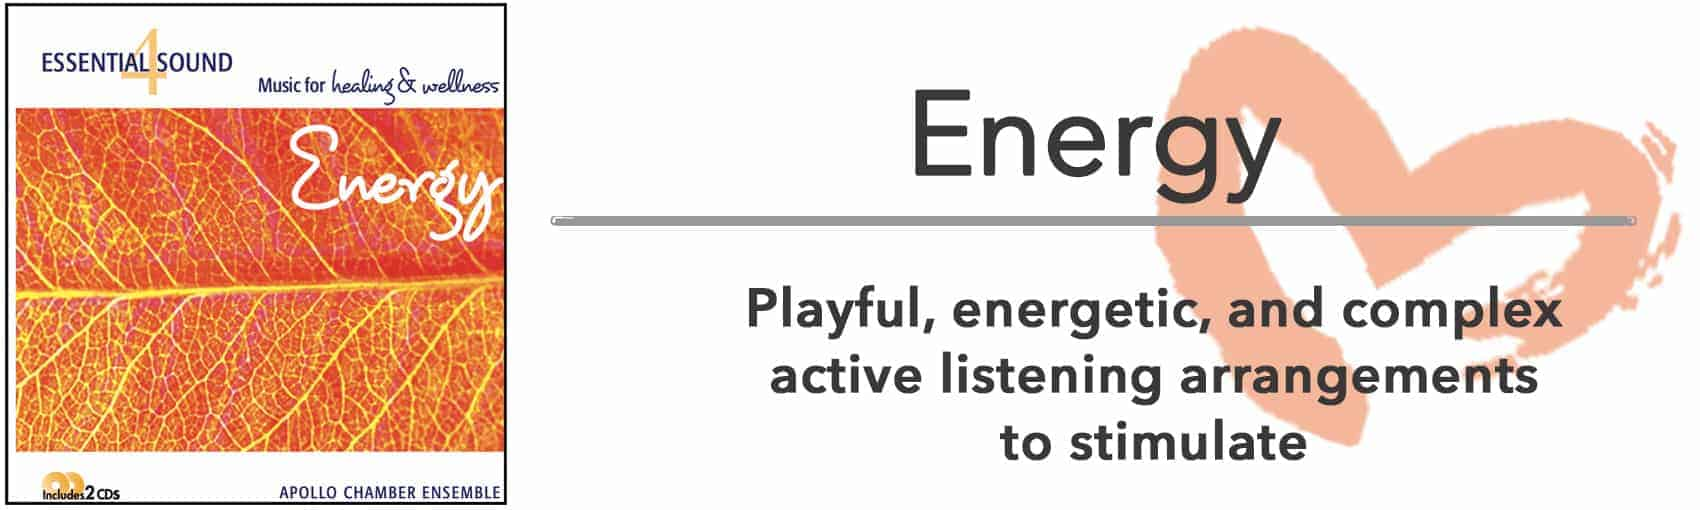 playful energetic music to increase energy